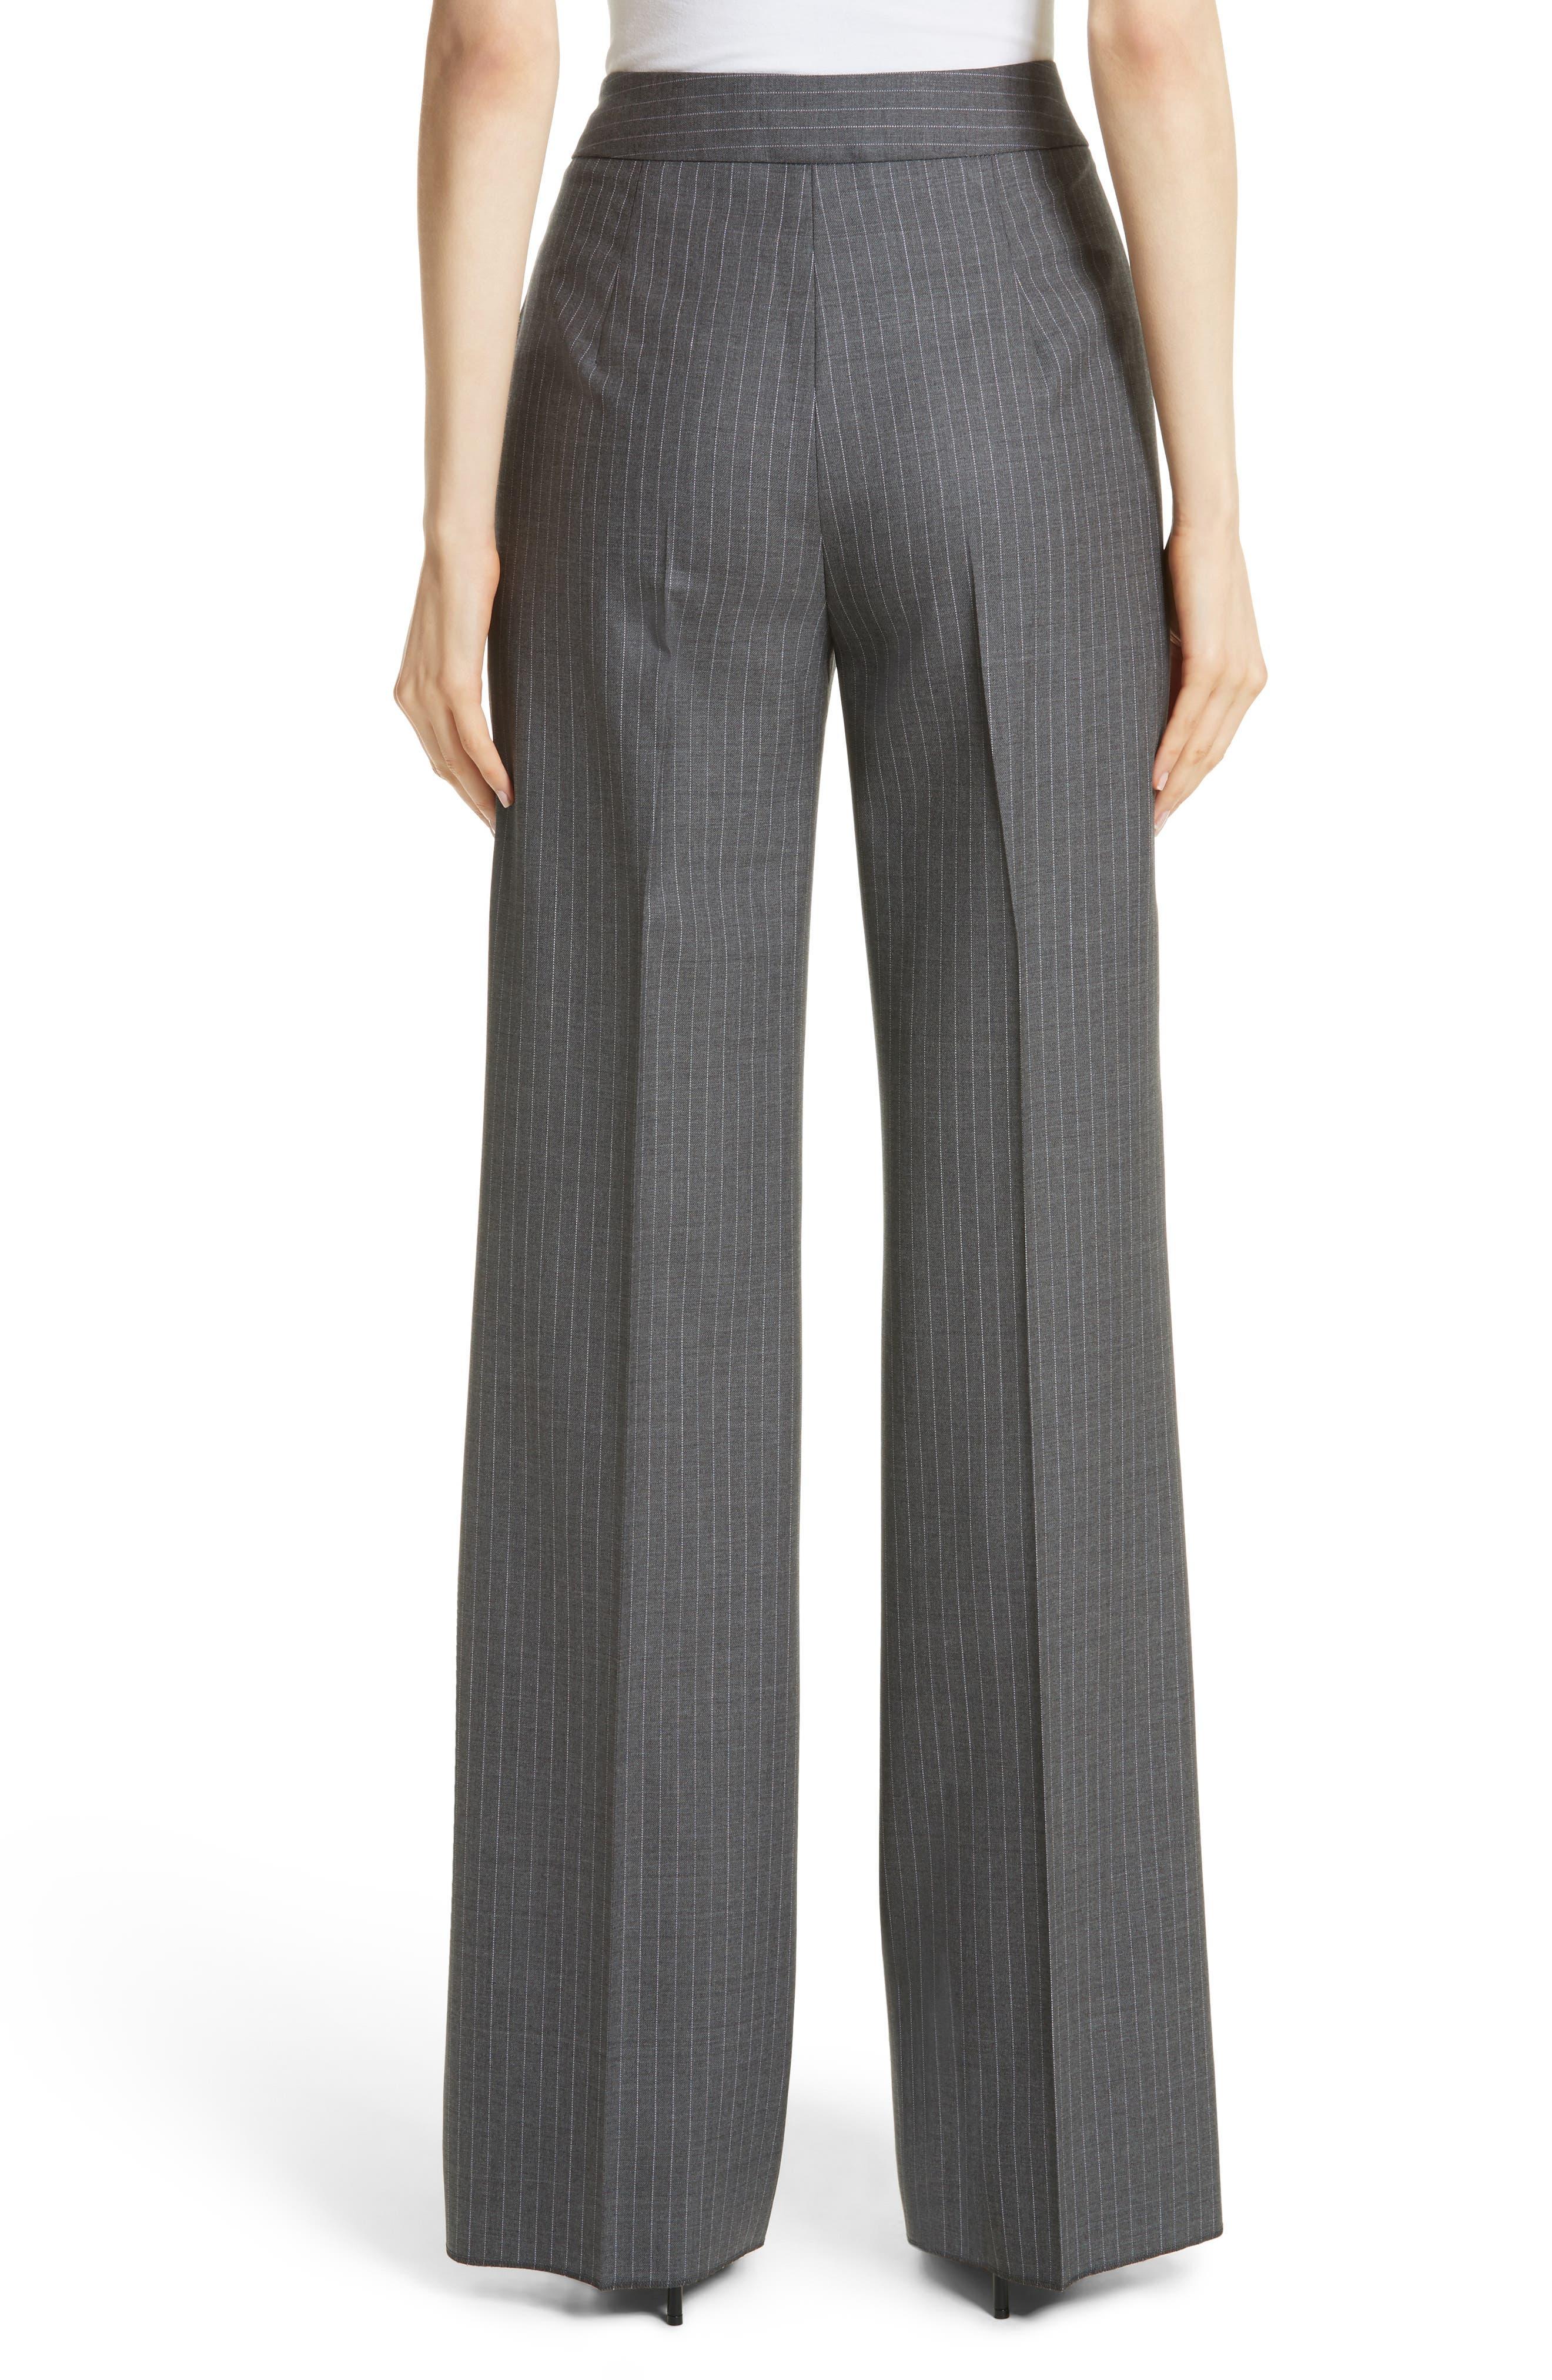 Garibo Stretch Wool Pinstripe Pants,                             Alternate thumbnail 2, color,